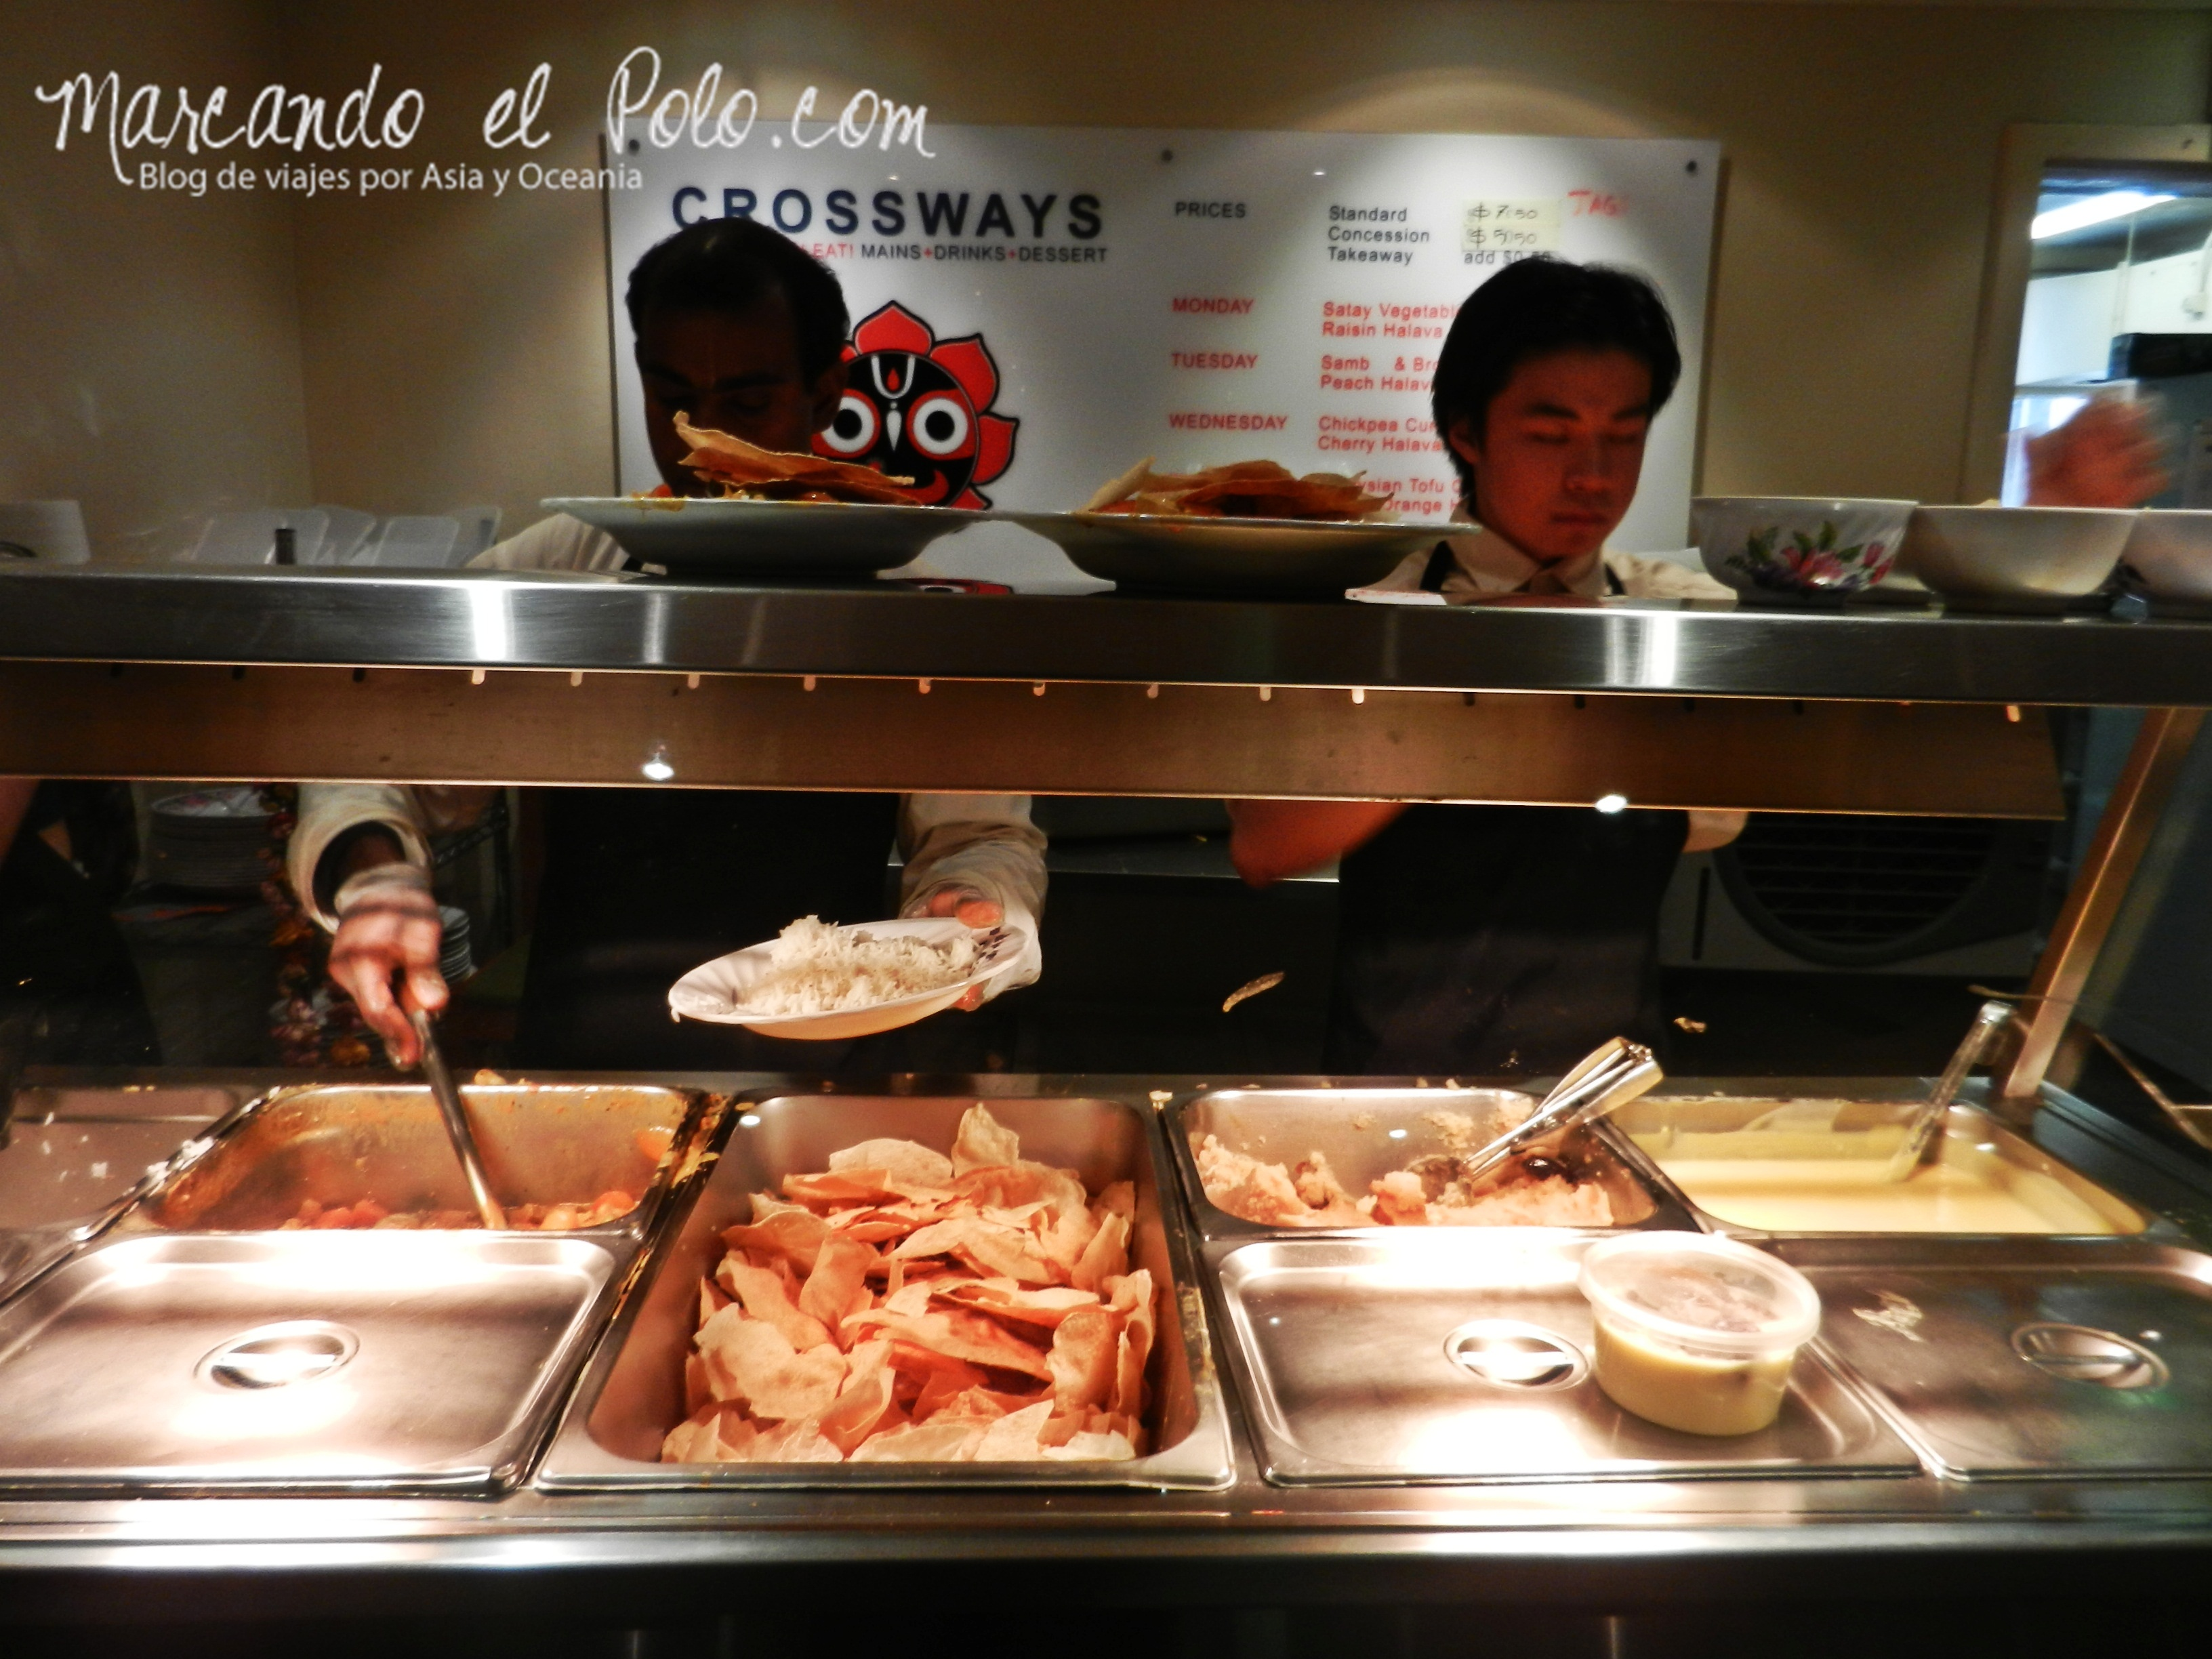 Viajar barato por Melbourne: Restaurante hare krishna Crossways